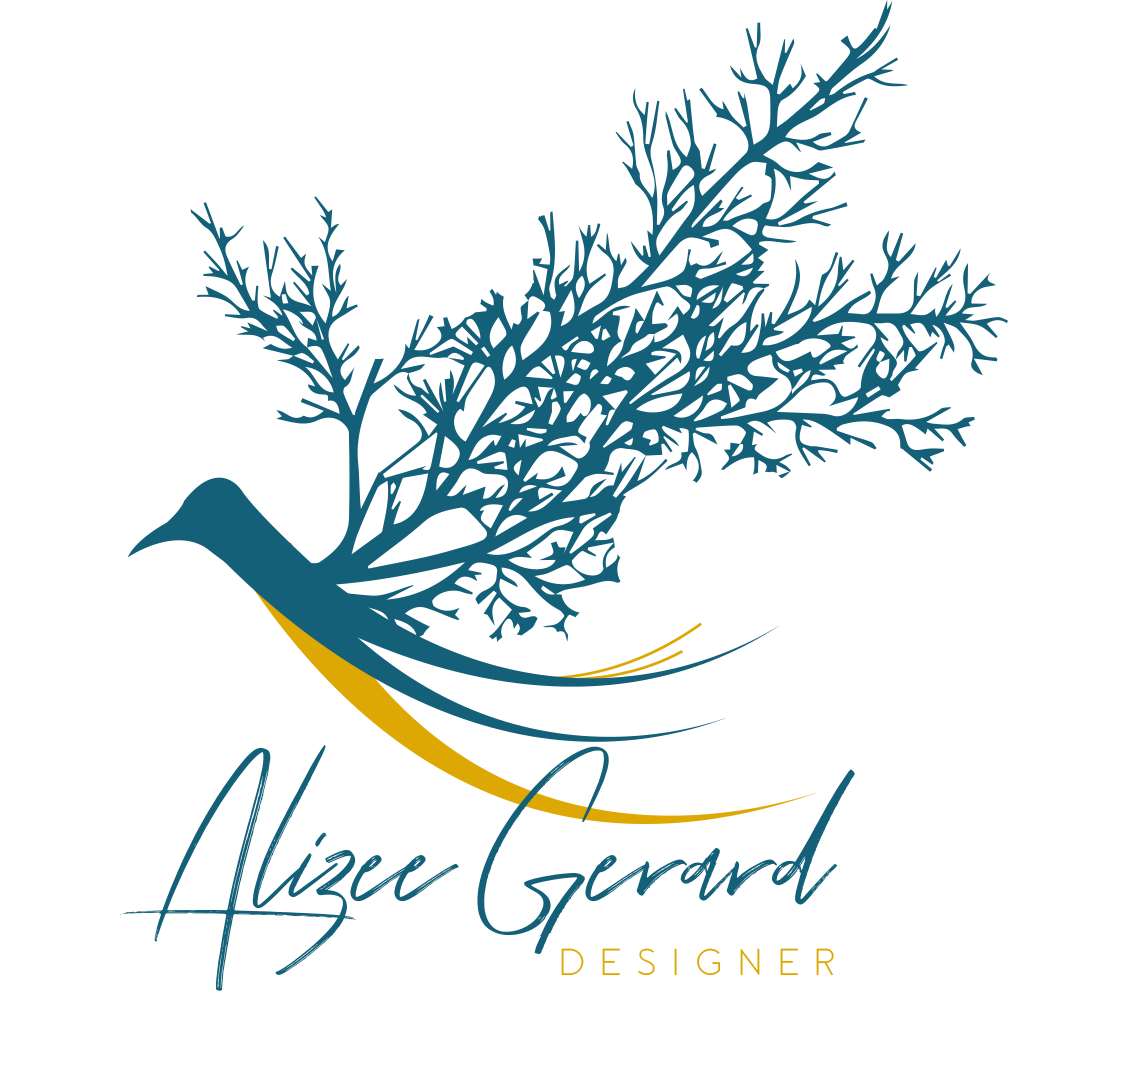 Alizée Gerard | Designer